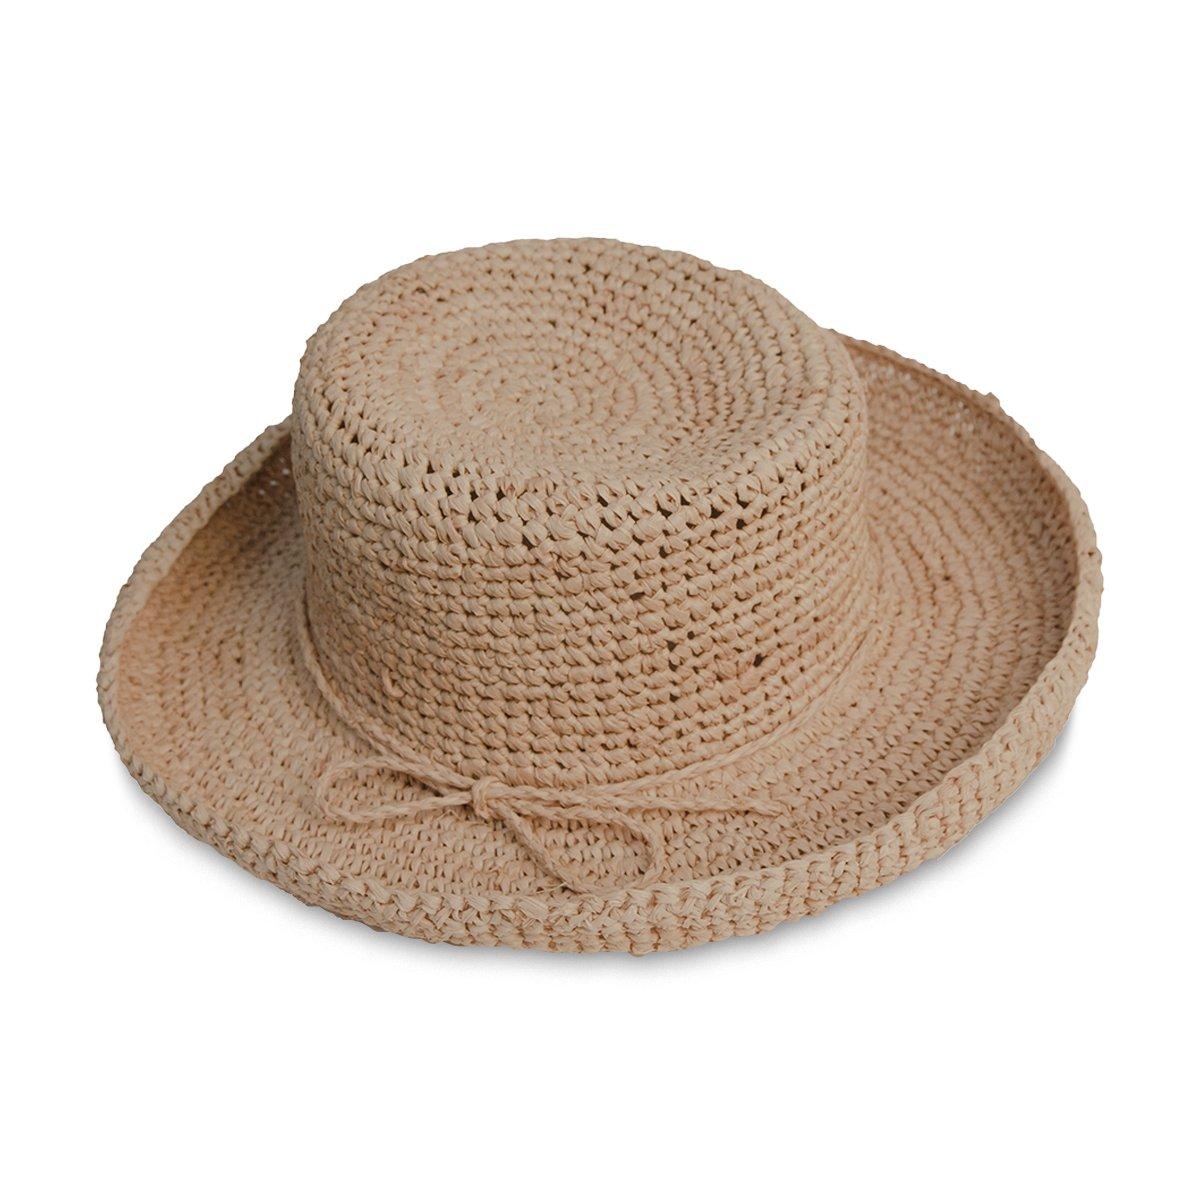 Betmar Natural Straw Hat